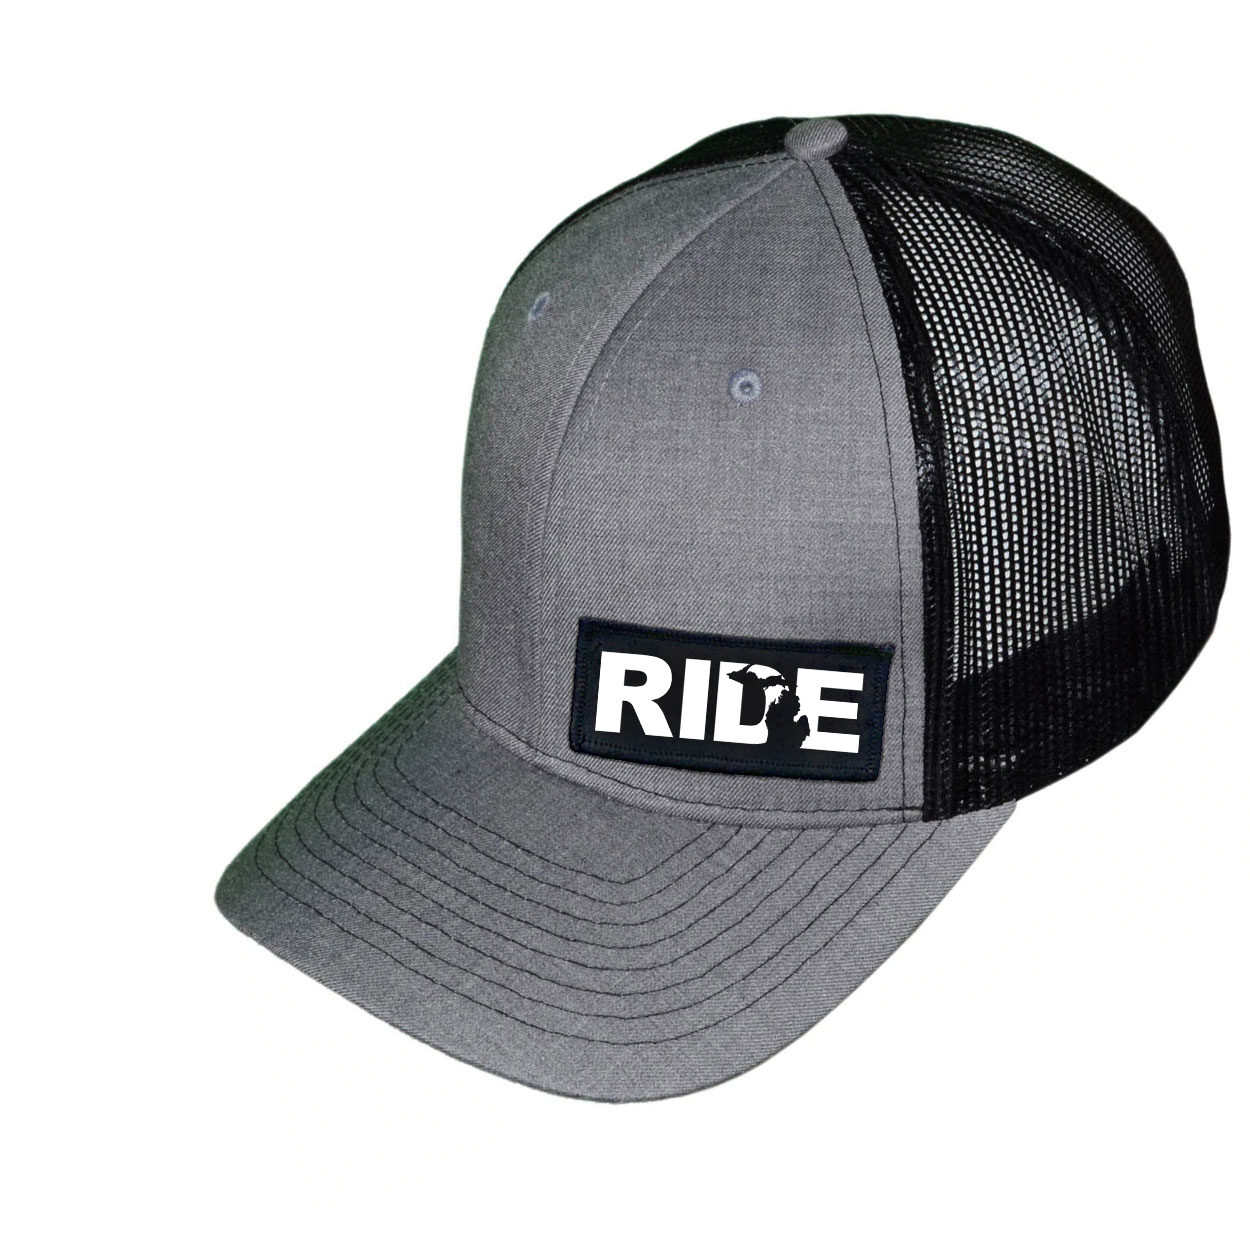 Ride Michigan Night Out Woven Patch Snapback Trucker Hat Heather Gray/Black (White Logo)